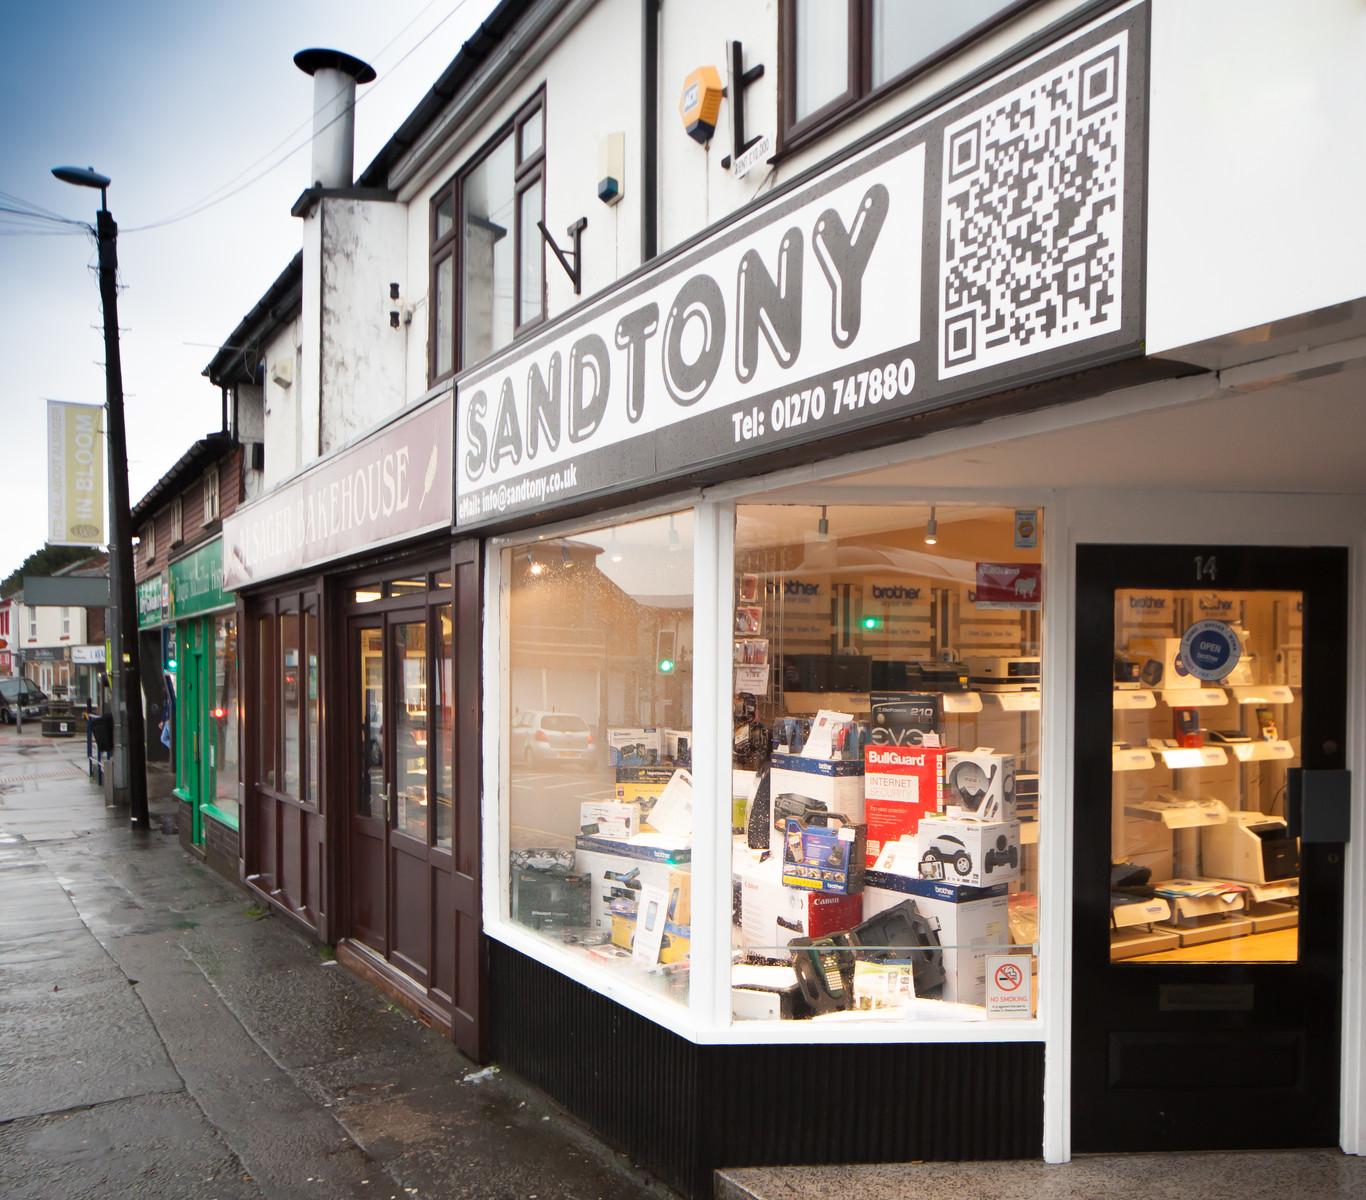 sandtony-2019-9415-x3.jpg